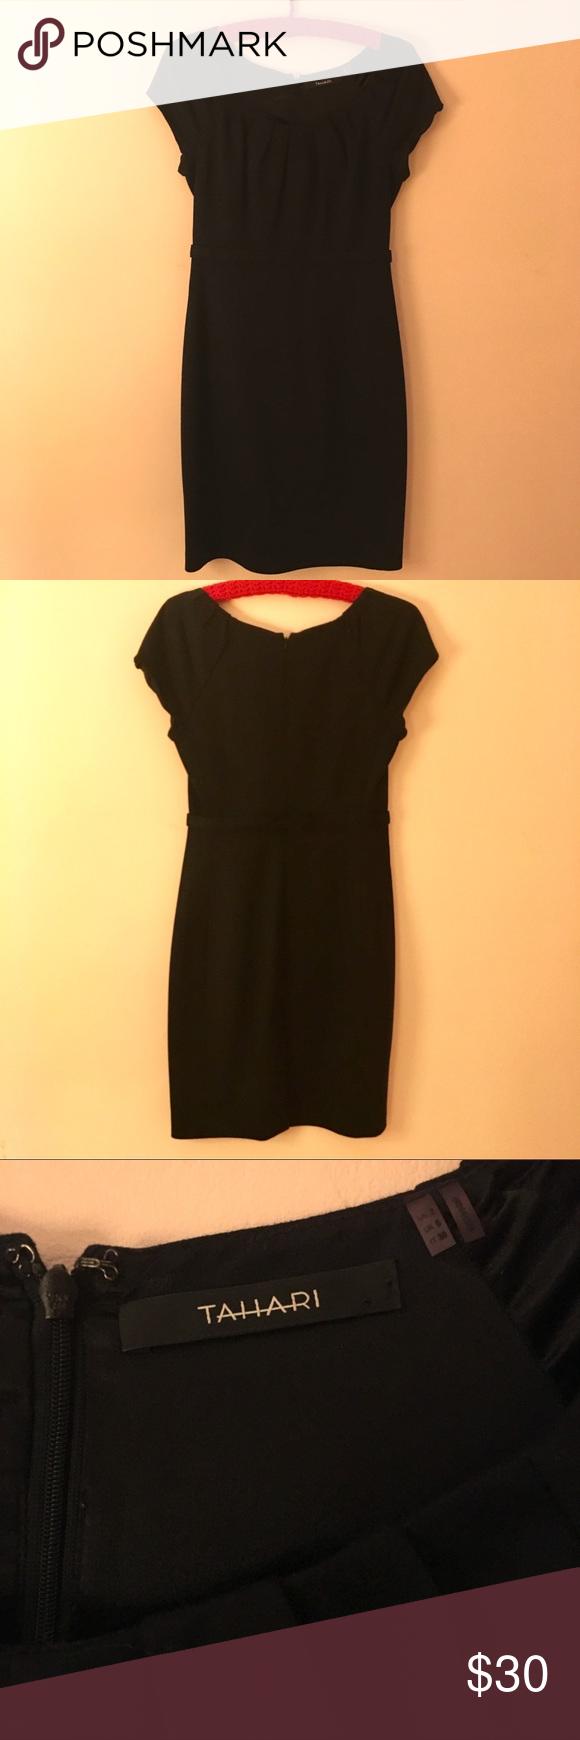 Tahari Black Dress Size 2 In 2020 Black Business Dress Black Dress Classic Black Dress [ 1740 x 580 Pixel ]